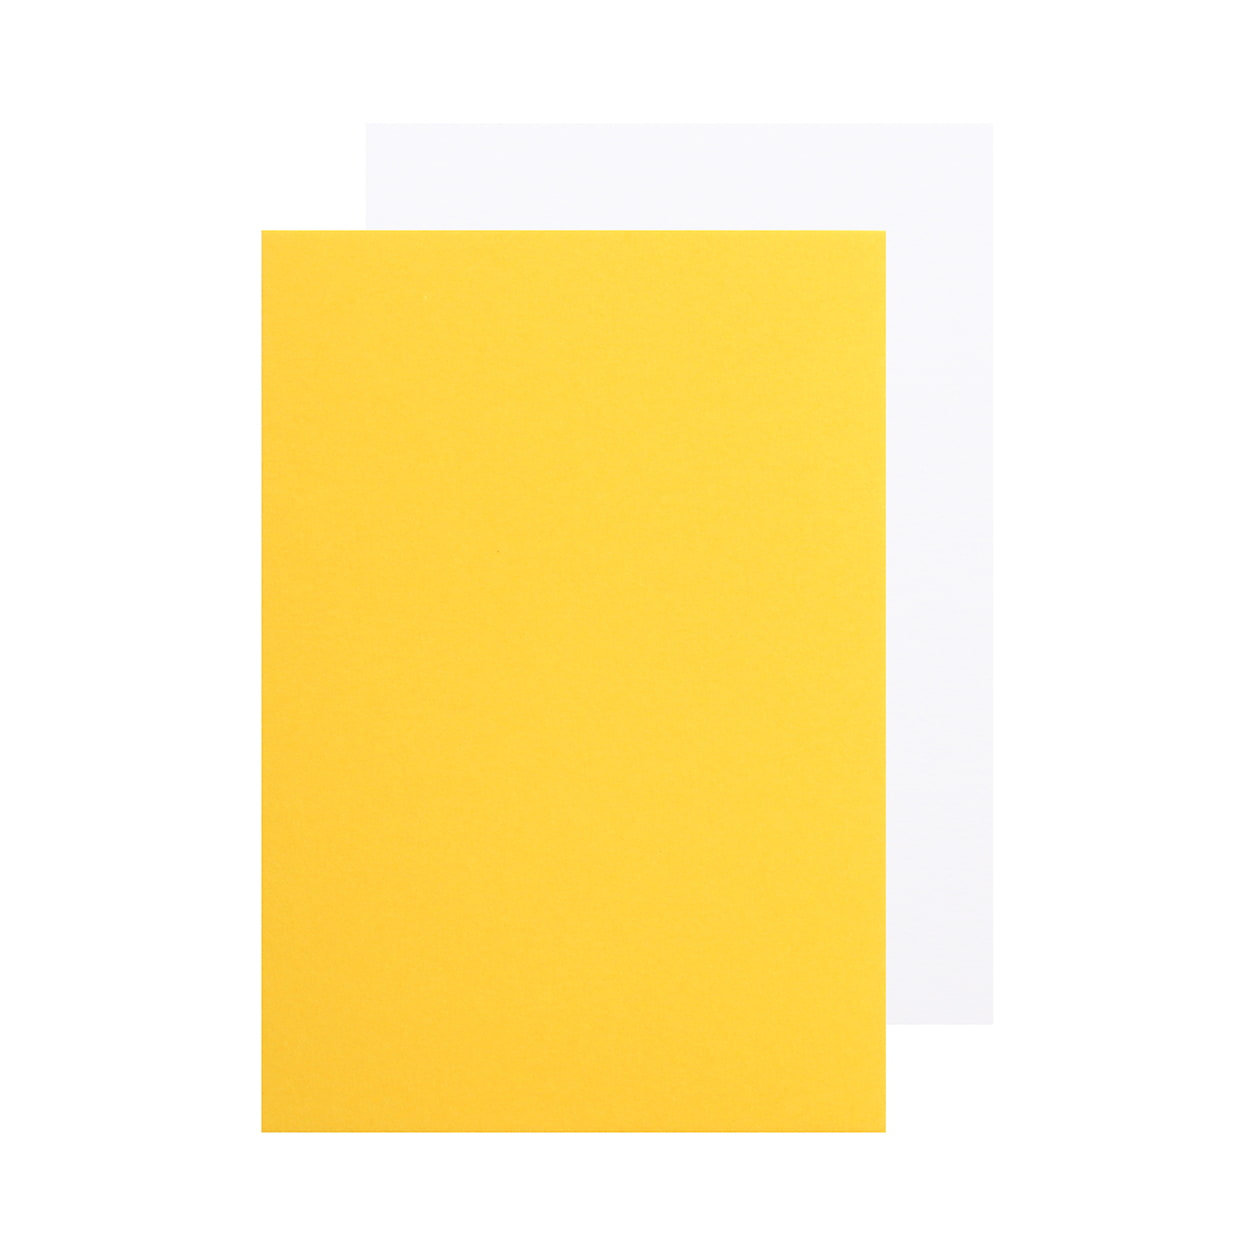 Pカード 二層合紙 黄色×スノーホワイト 477.1g